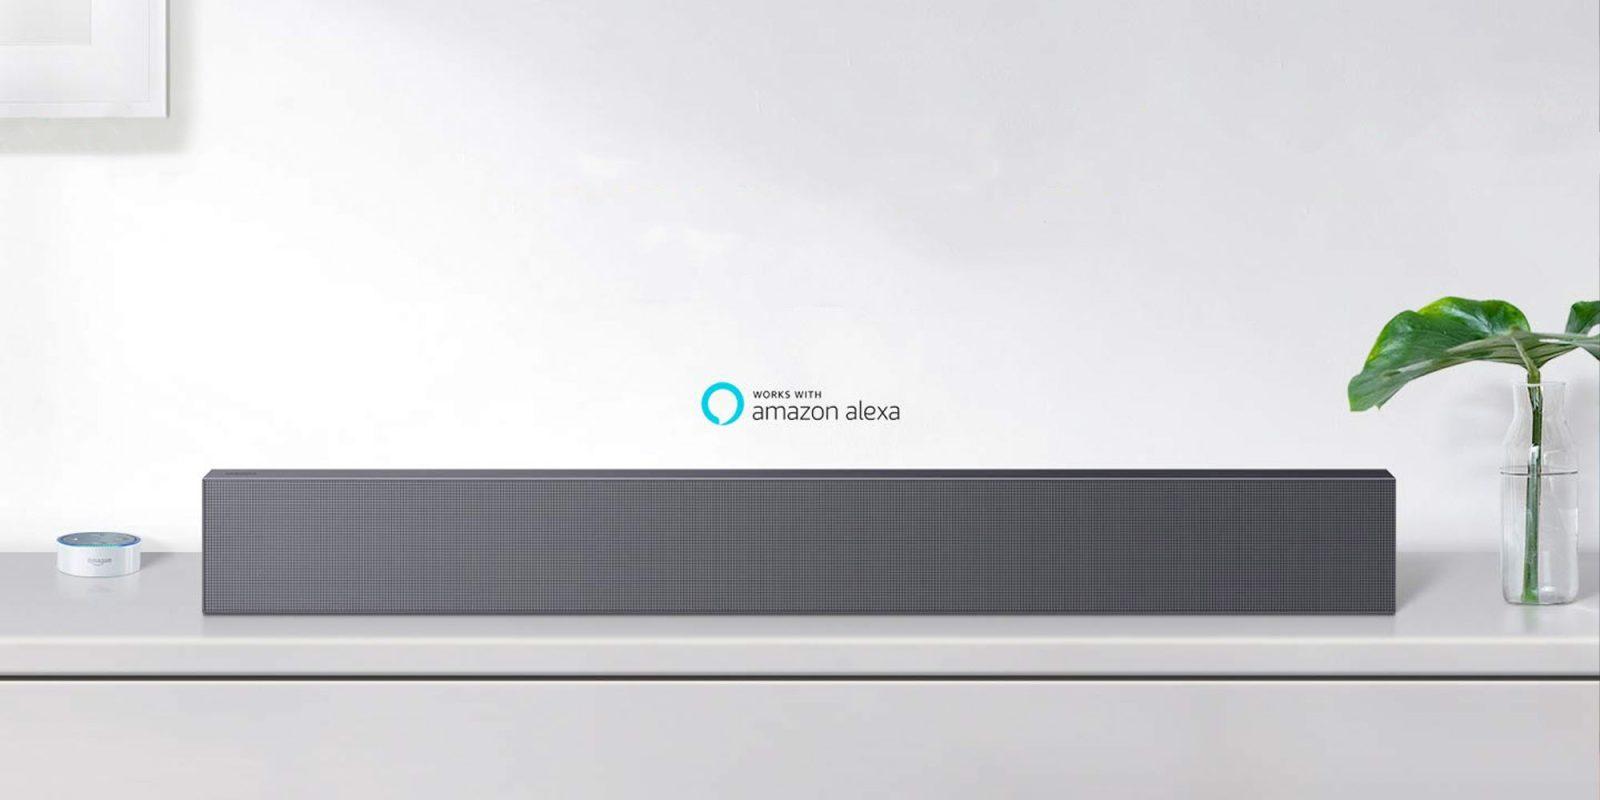 Samsung's Sound+ Slim 3-Channel Soundbar has Alexa built-in: $299 (Reg. $400+)